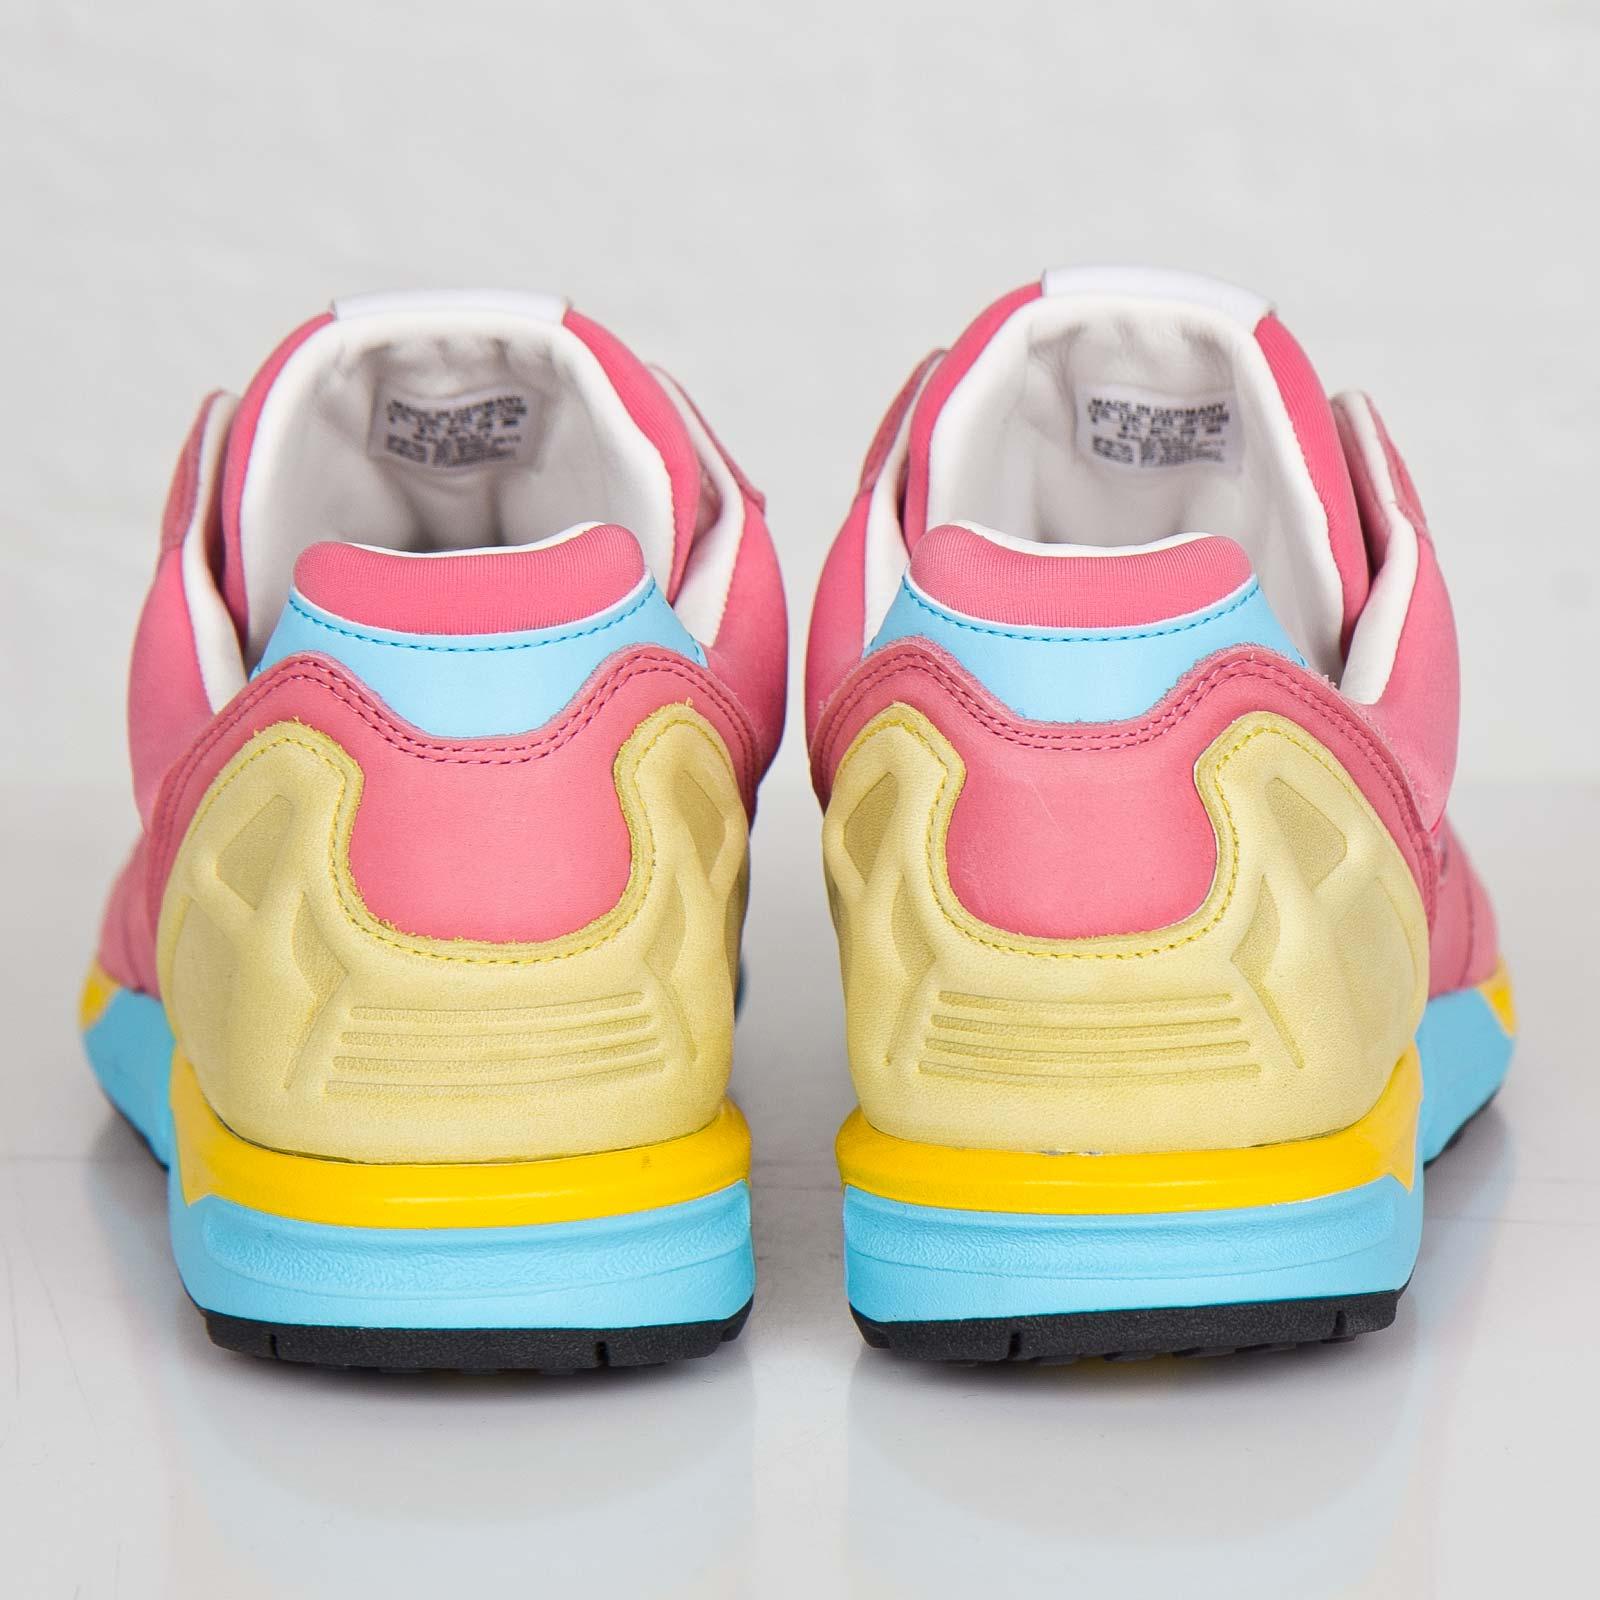 885c30ea5 adidas ZX 8000 Bravo - M18629 - Sneakersnstuff